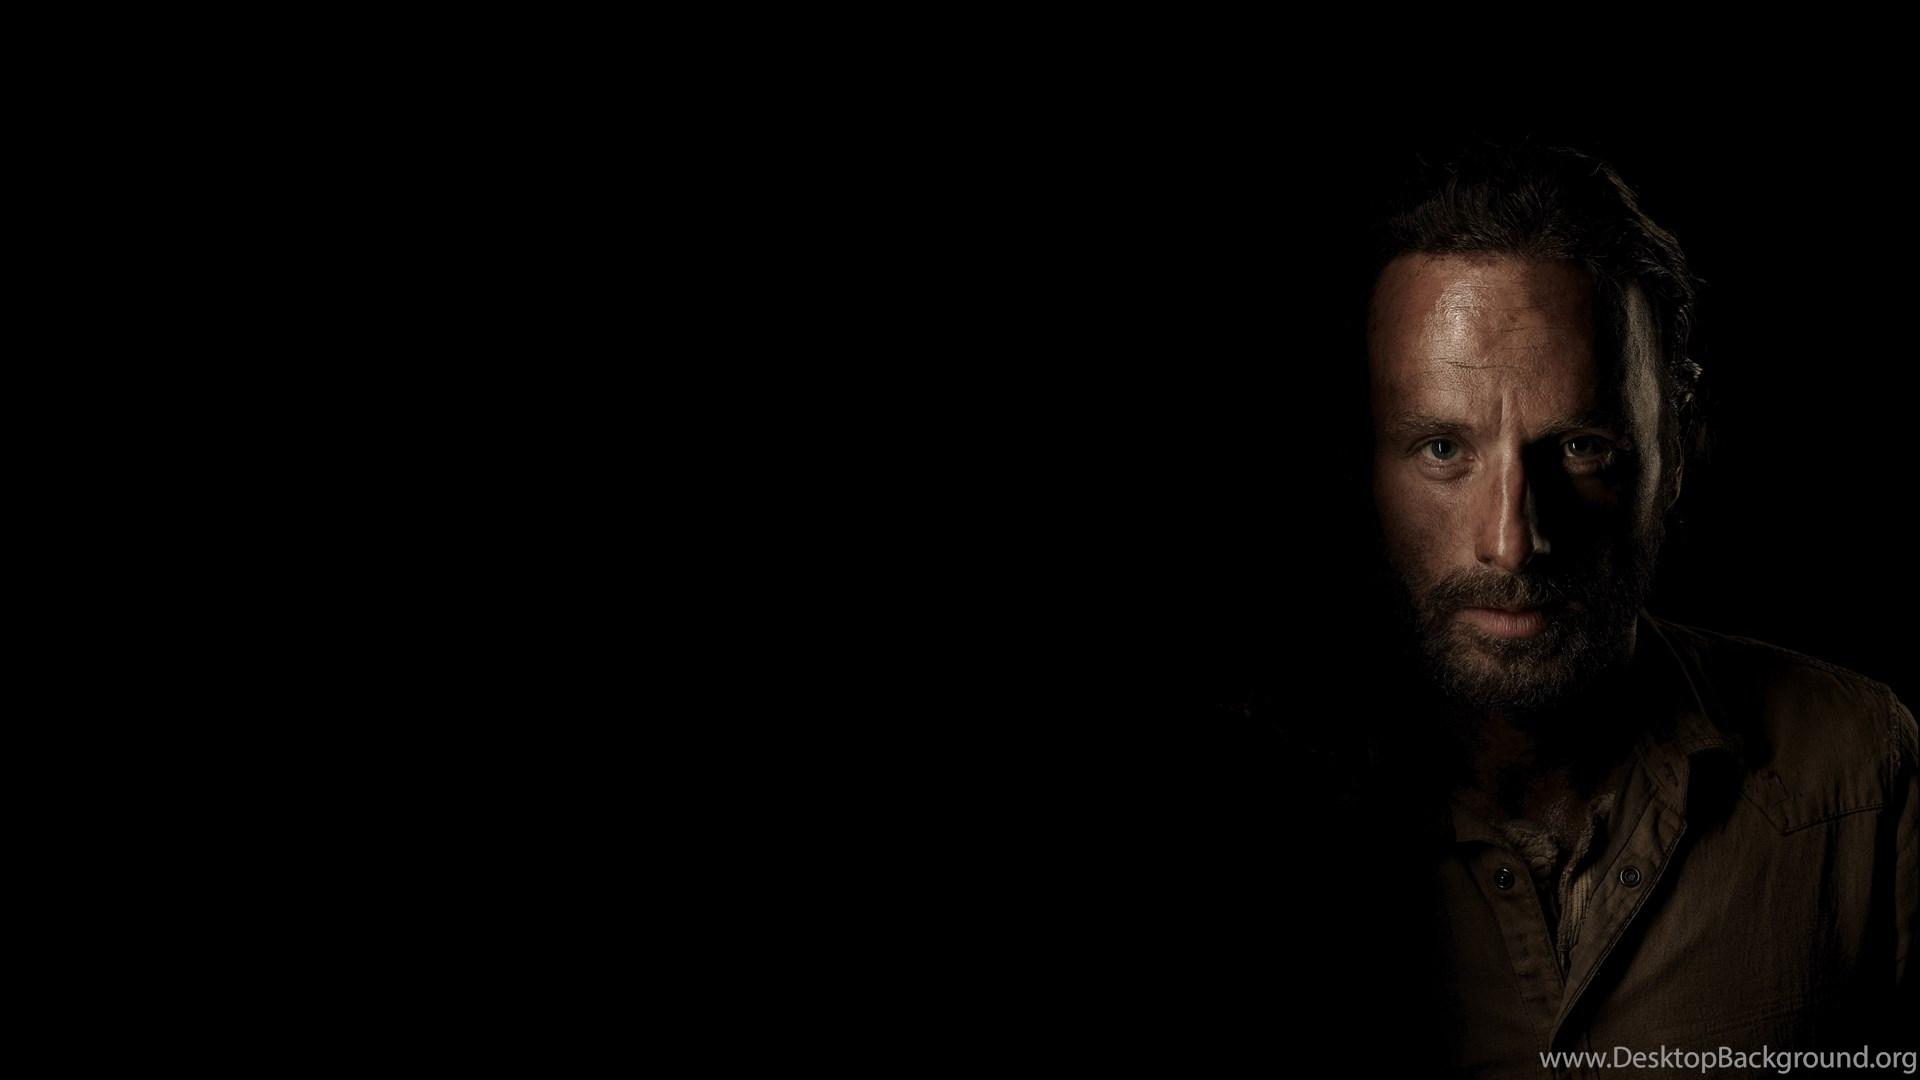 The Walking Dead Wallpapers Rick Grimes HD Expert Desktop